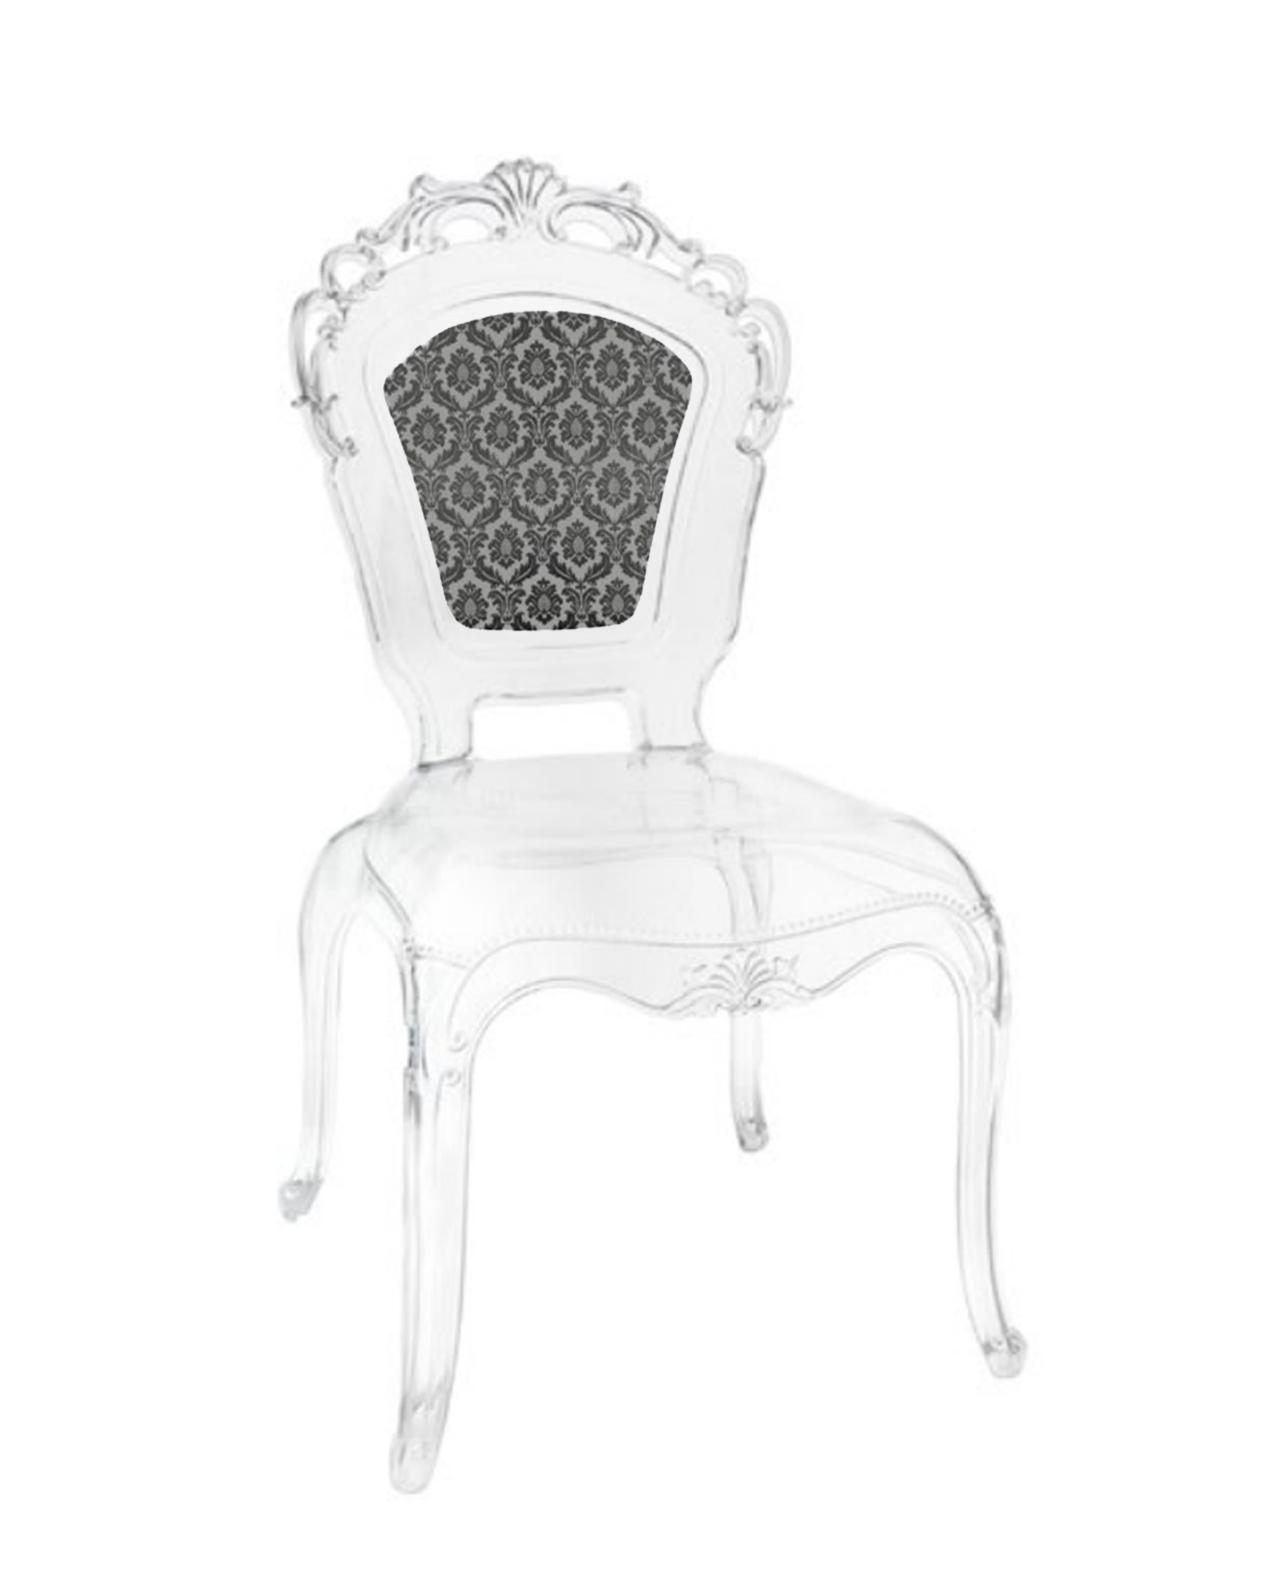 Sedia policarbonato con schienale Louis XIV Baci Milano - Mobilia ...